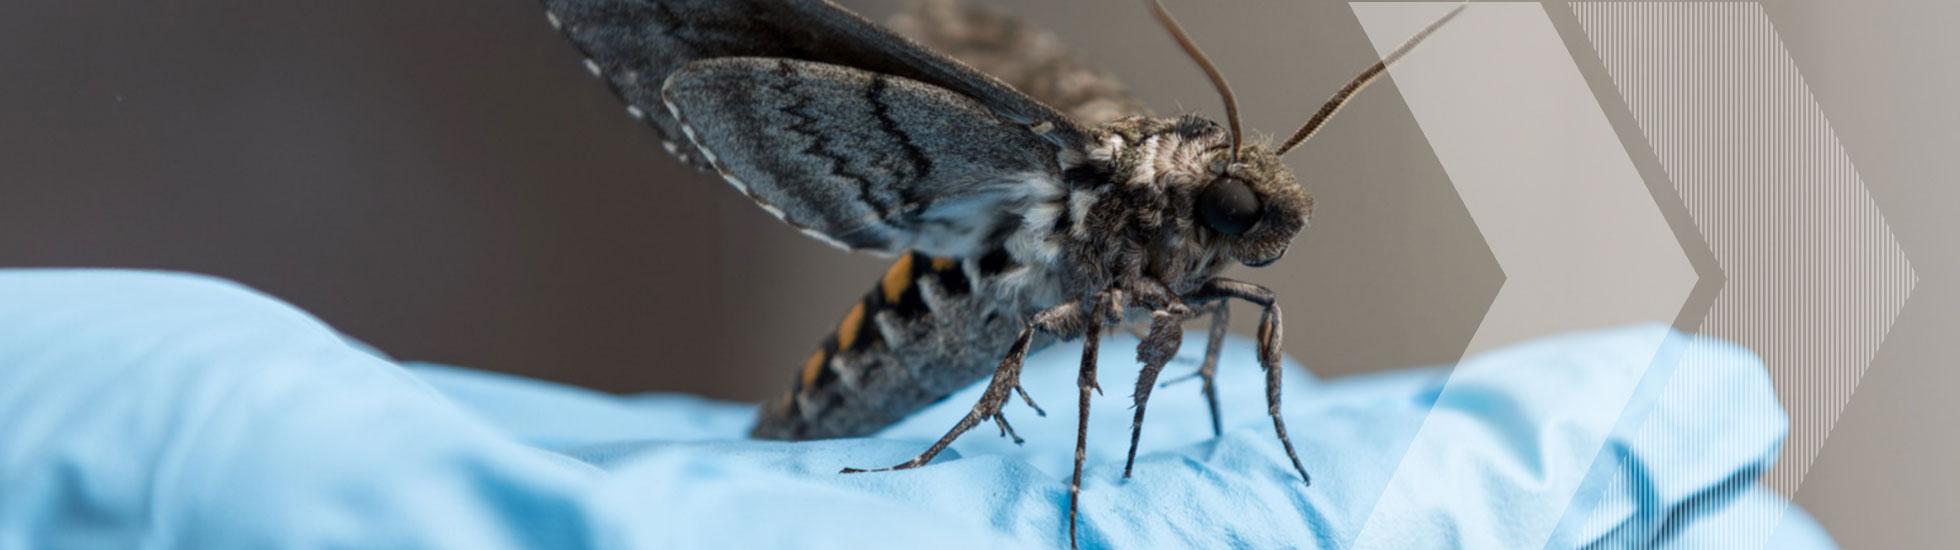 Hawk moth on a blue glove in Simon Sponberg's lab